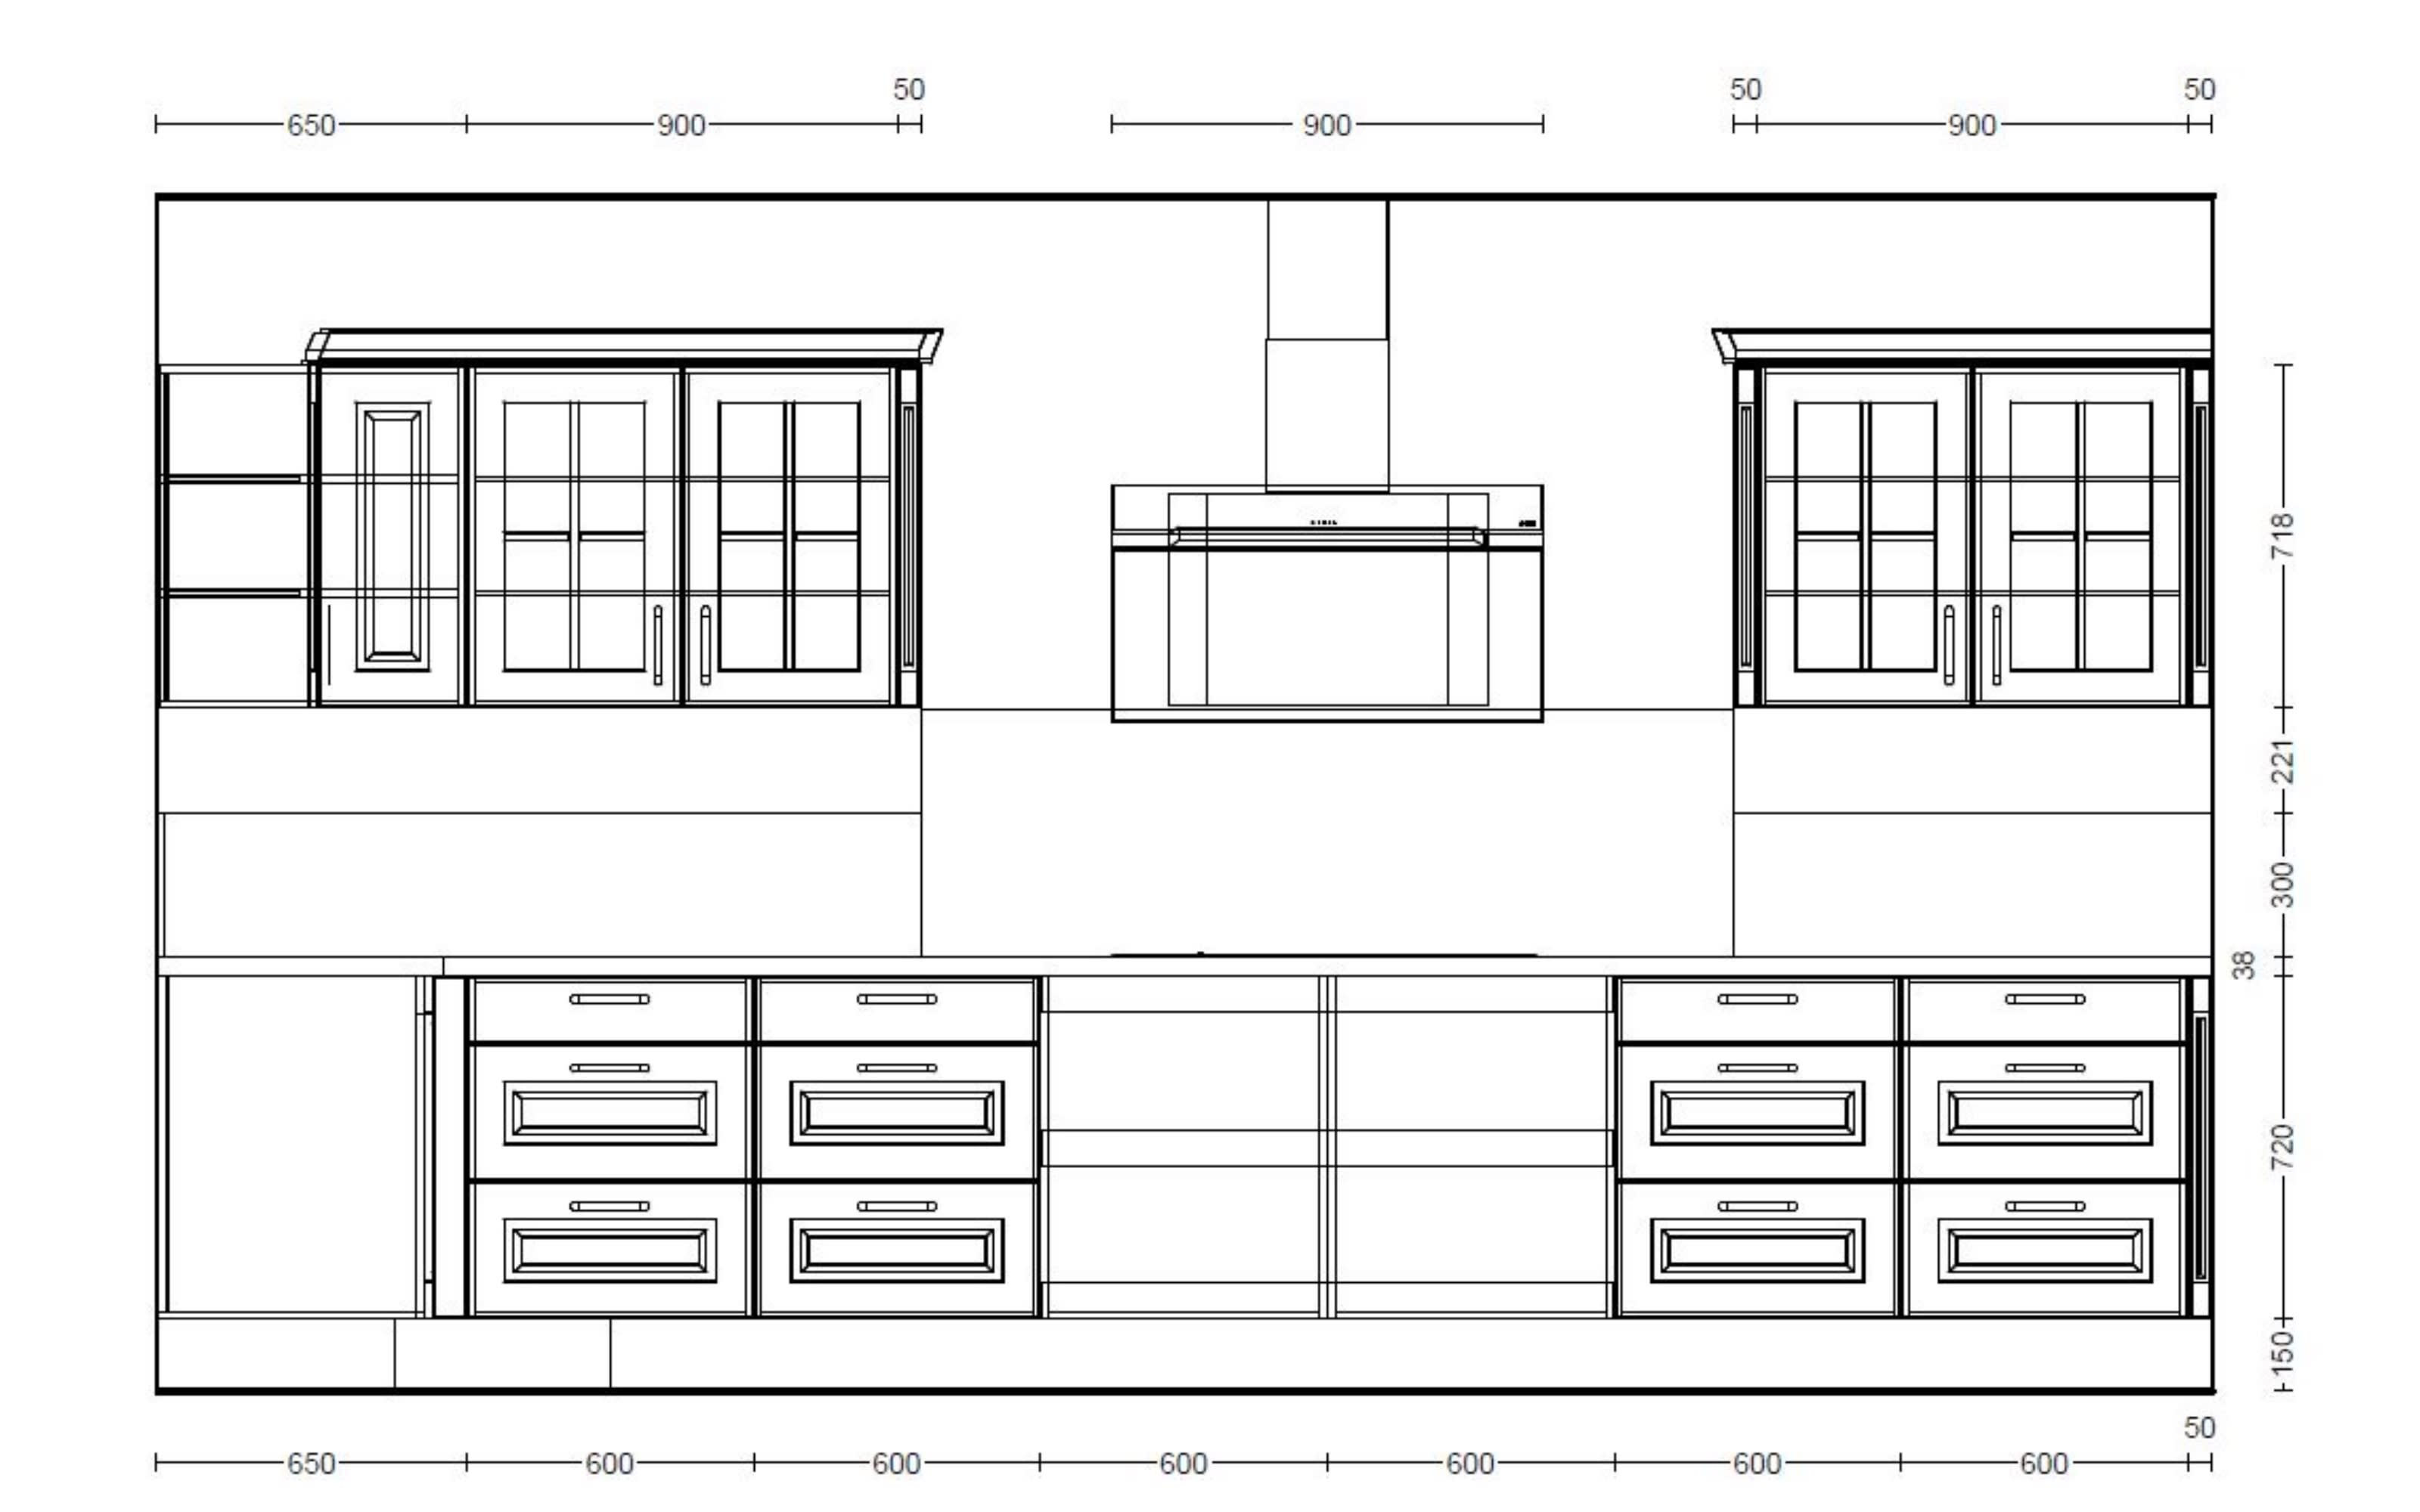 Einbauküche Sylt, Lack schwarz matt, inklusive Elektrogeräte